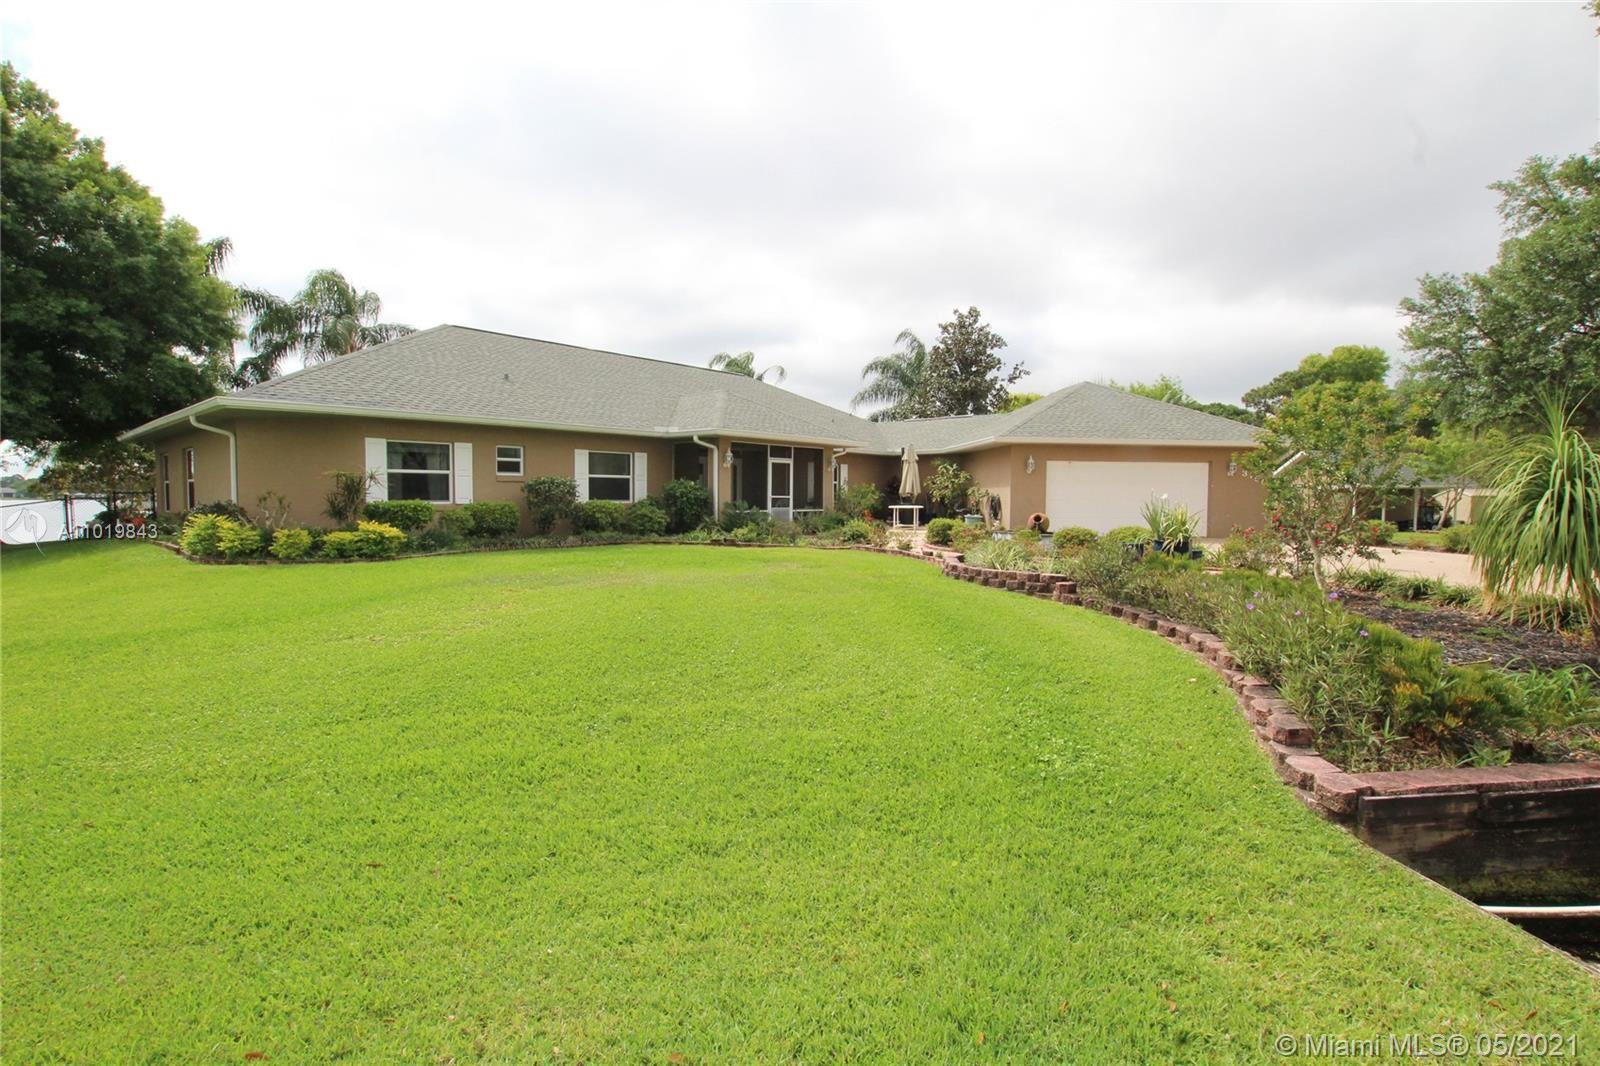 3150 Bluebird Avenue, Lake Placid, FL 33852 - #: A11019843